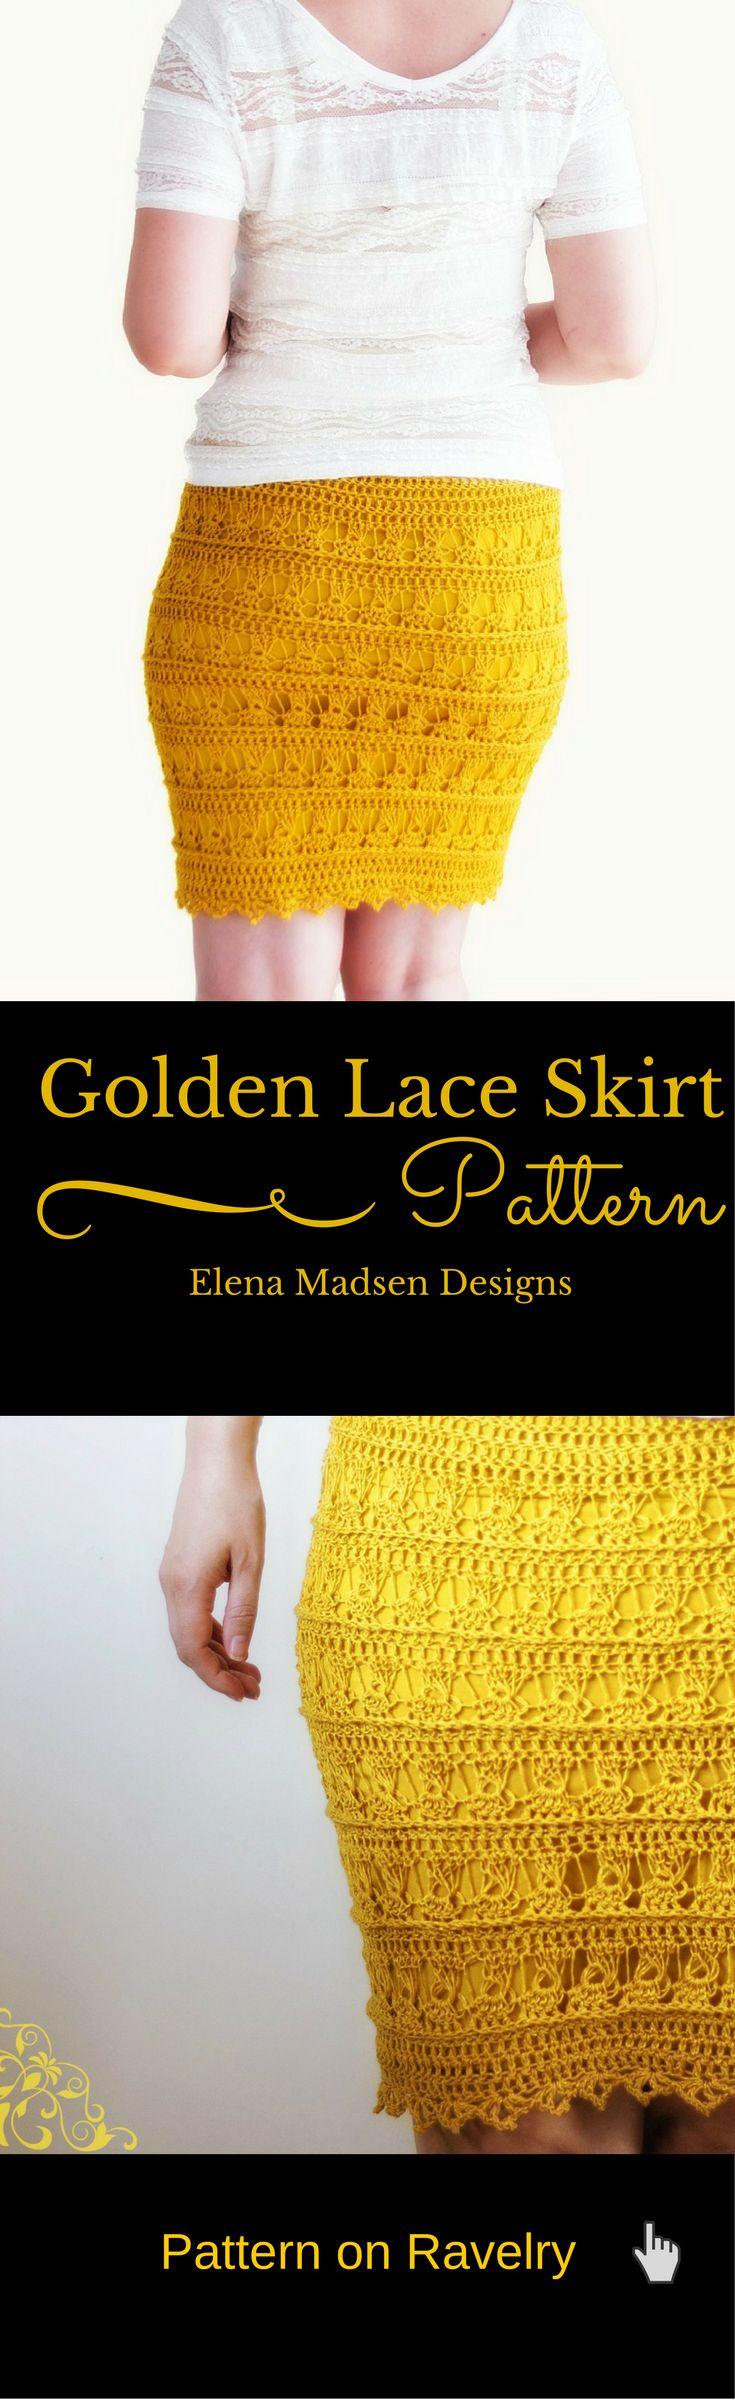 47 best Crochet Elena Madsen Designs images on Pinterest   Crochet ...